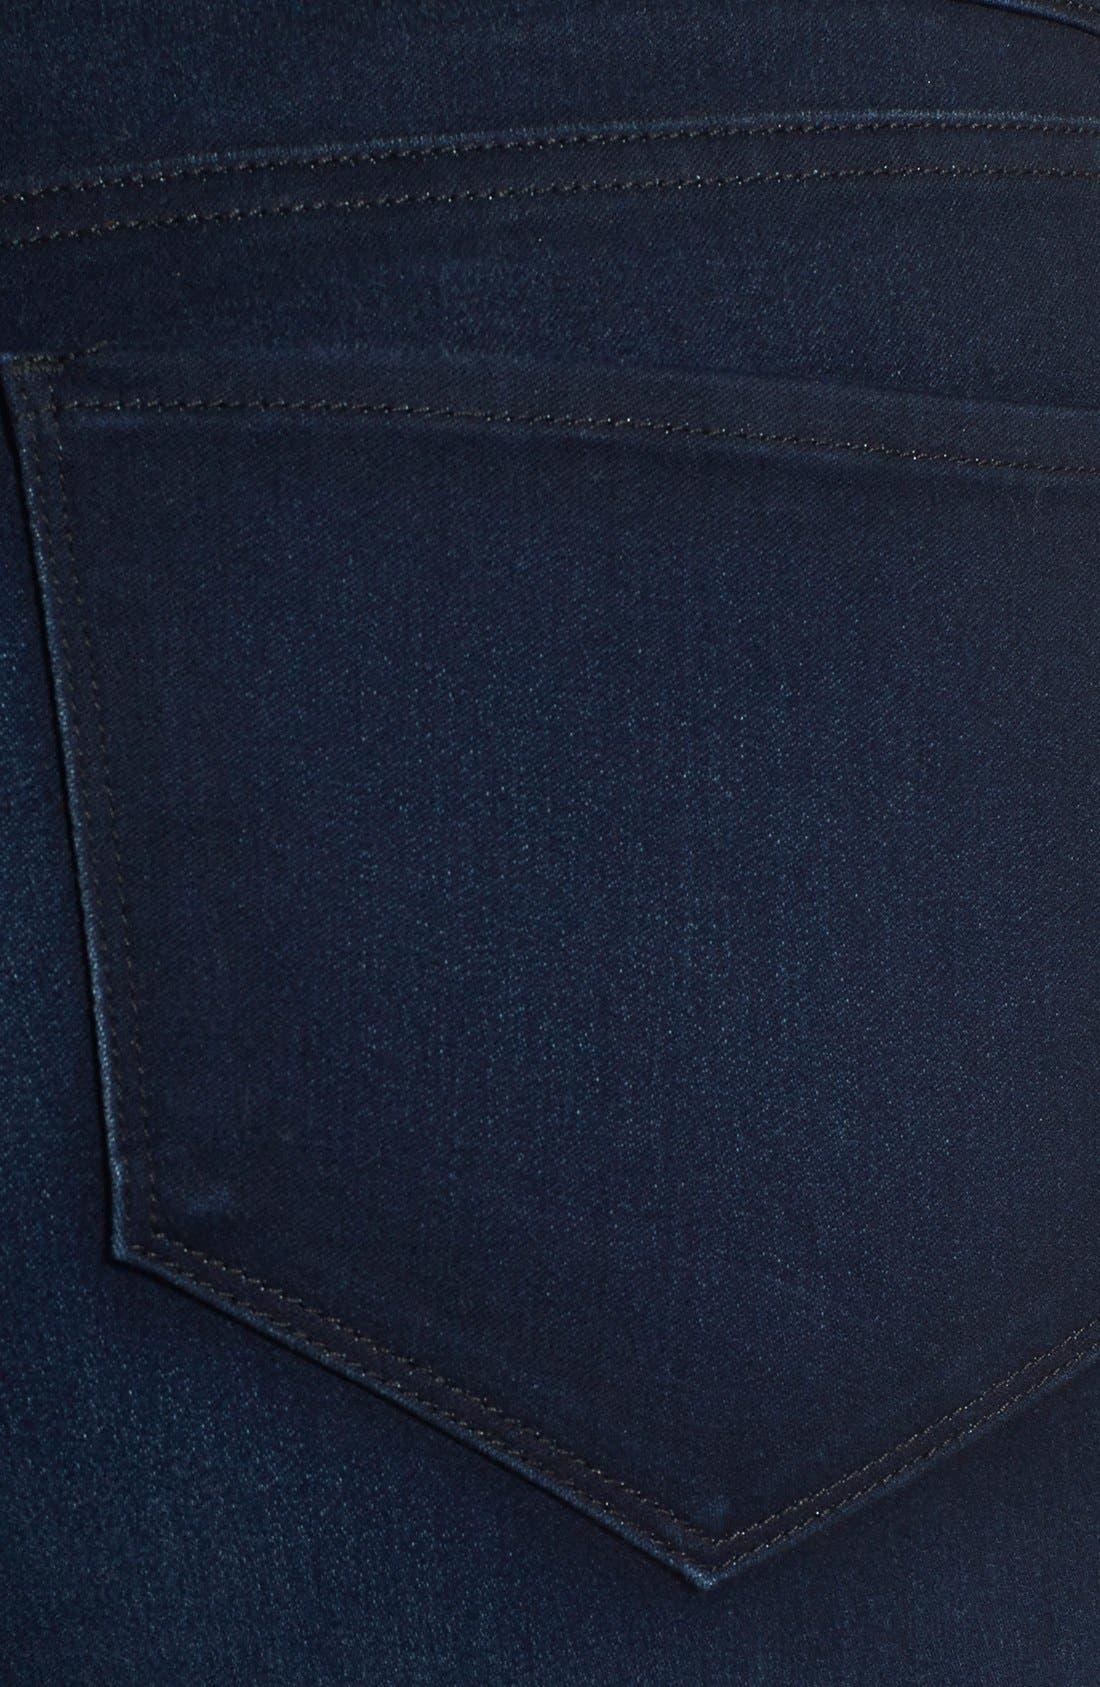 Alternate Image 3  - NYDJ 'Jade' Stretch Skinny Jeans (Norwell) (Plus Size)